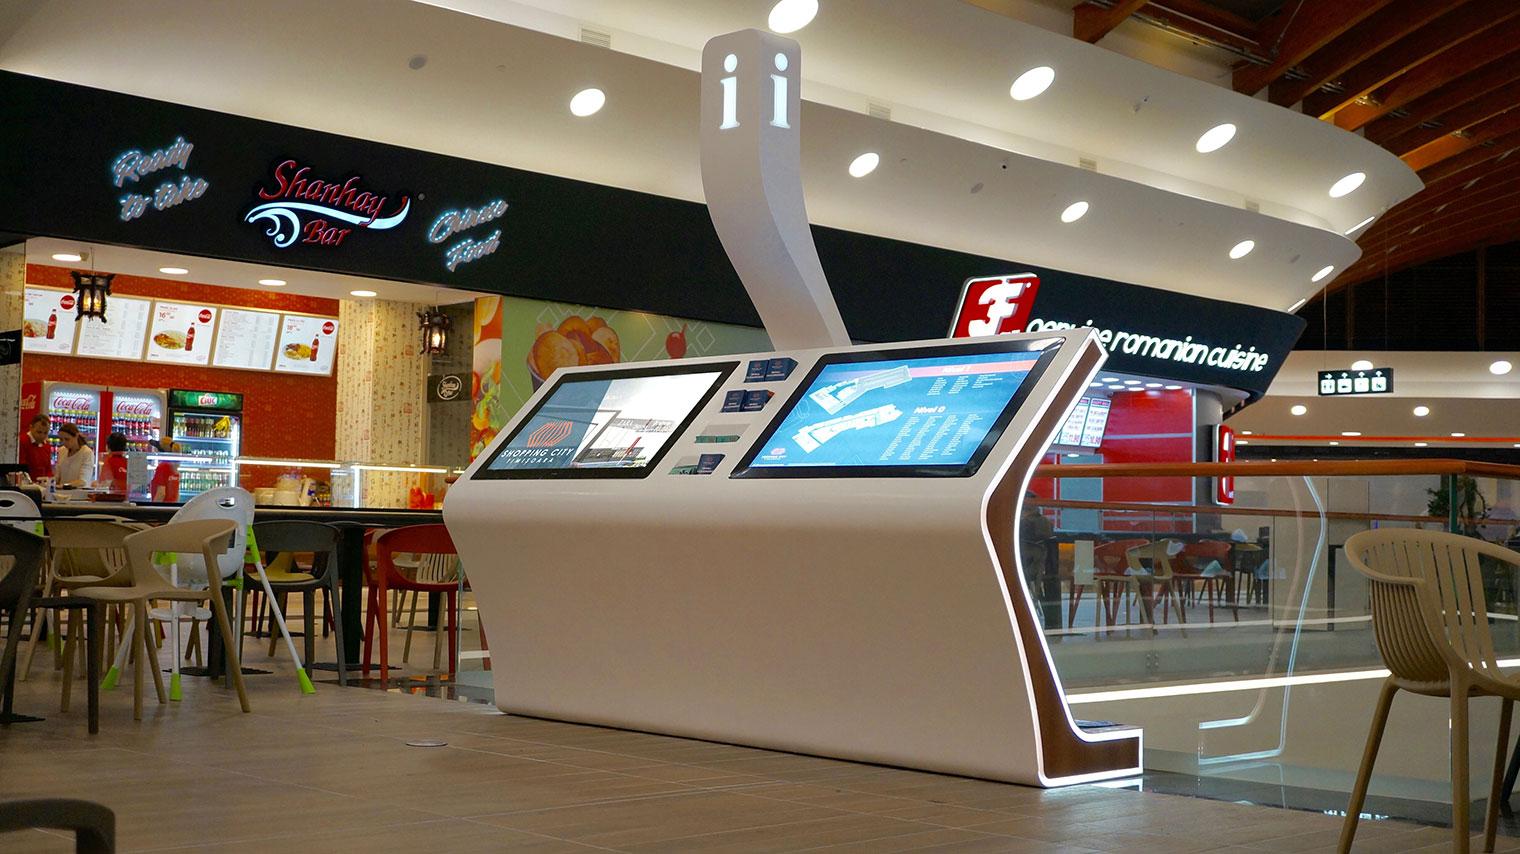 Mobilier Din Himacs Pentru Mall Shopping City Timi Oara